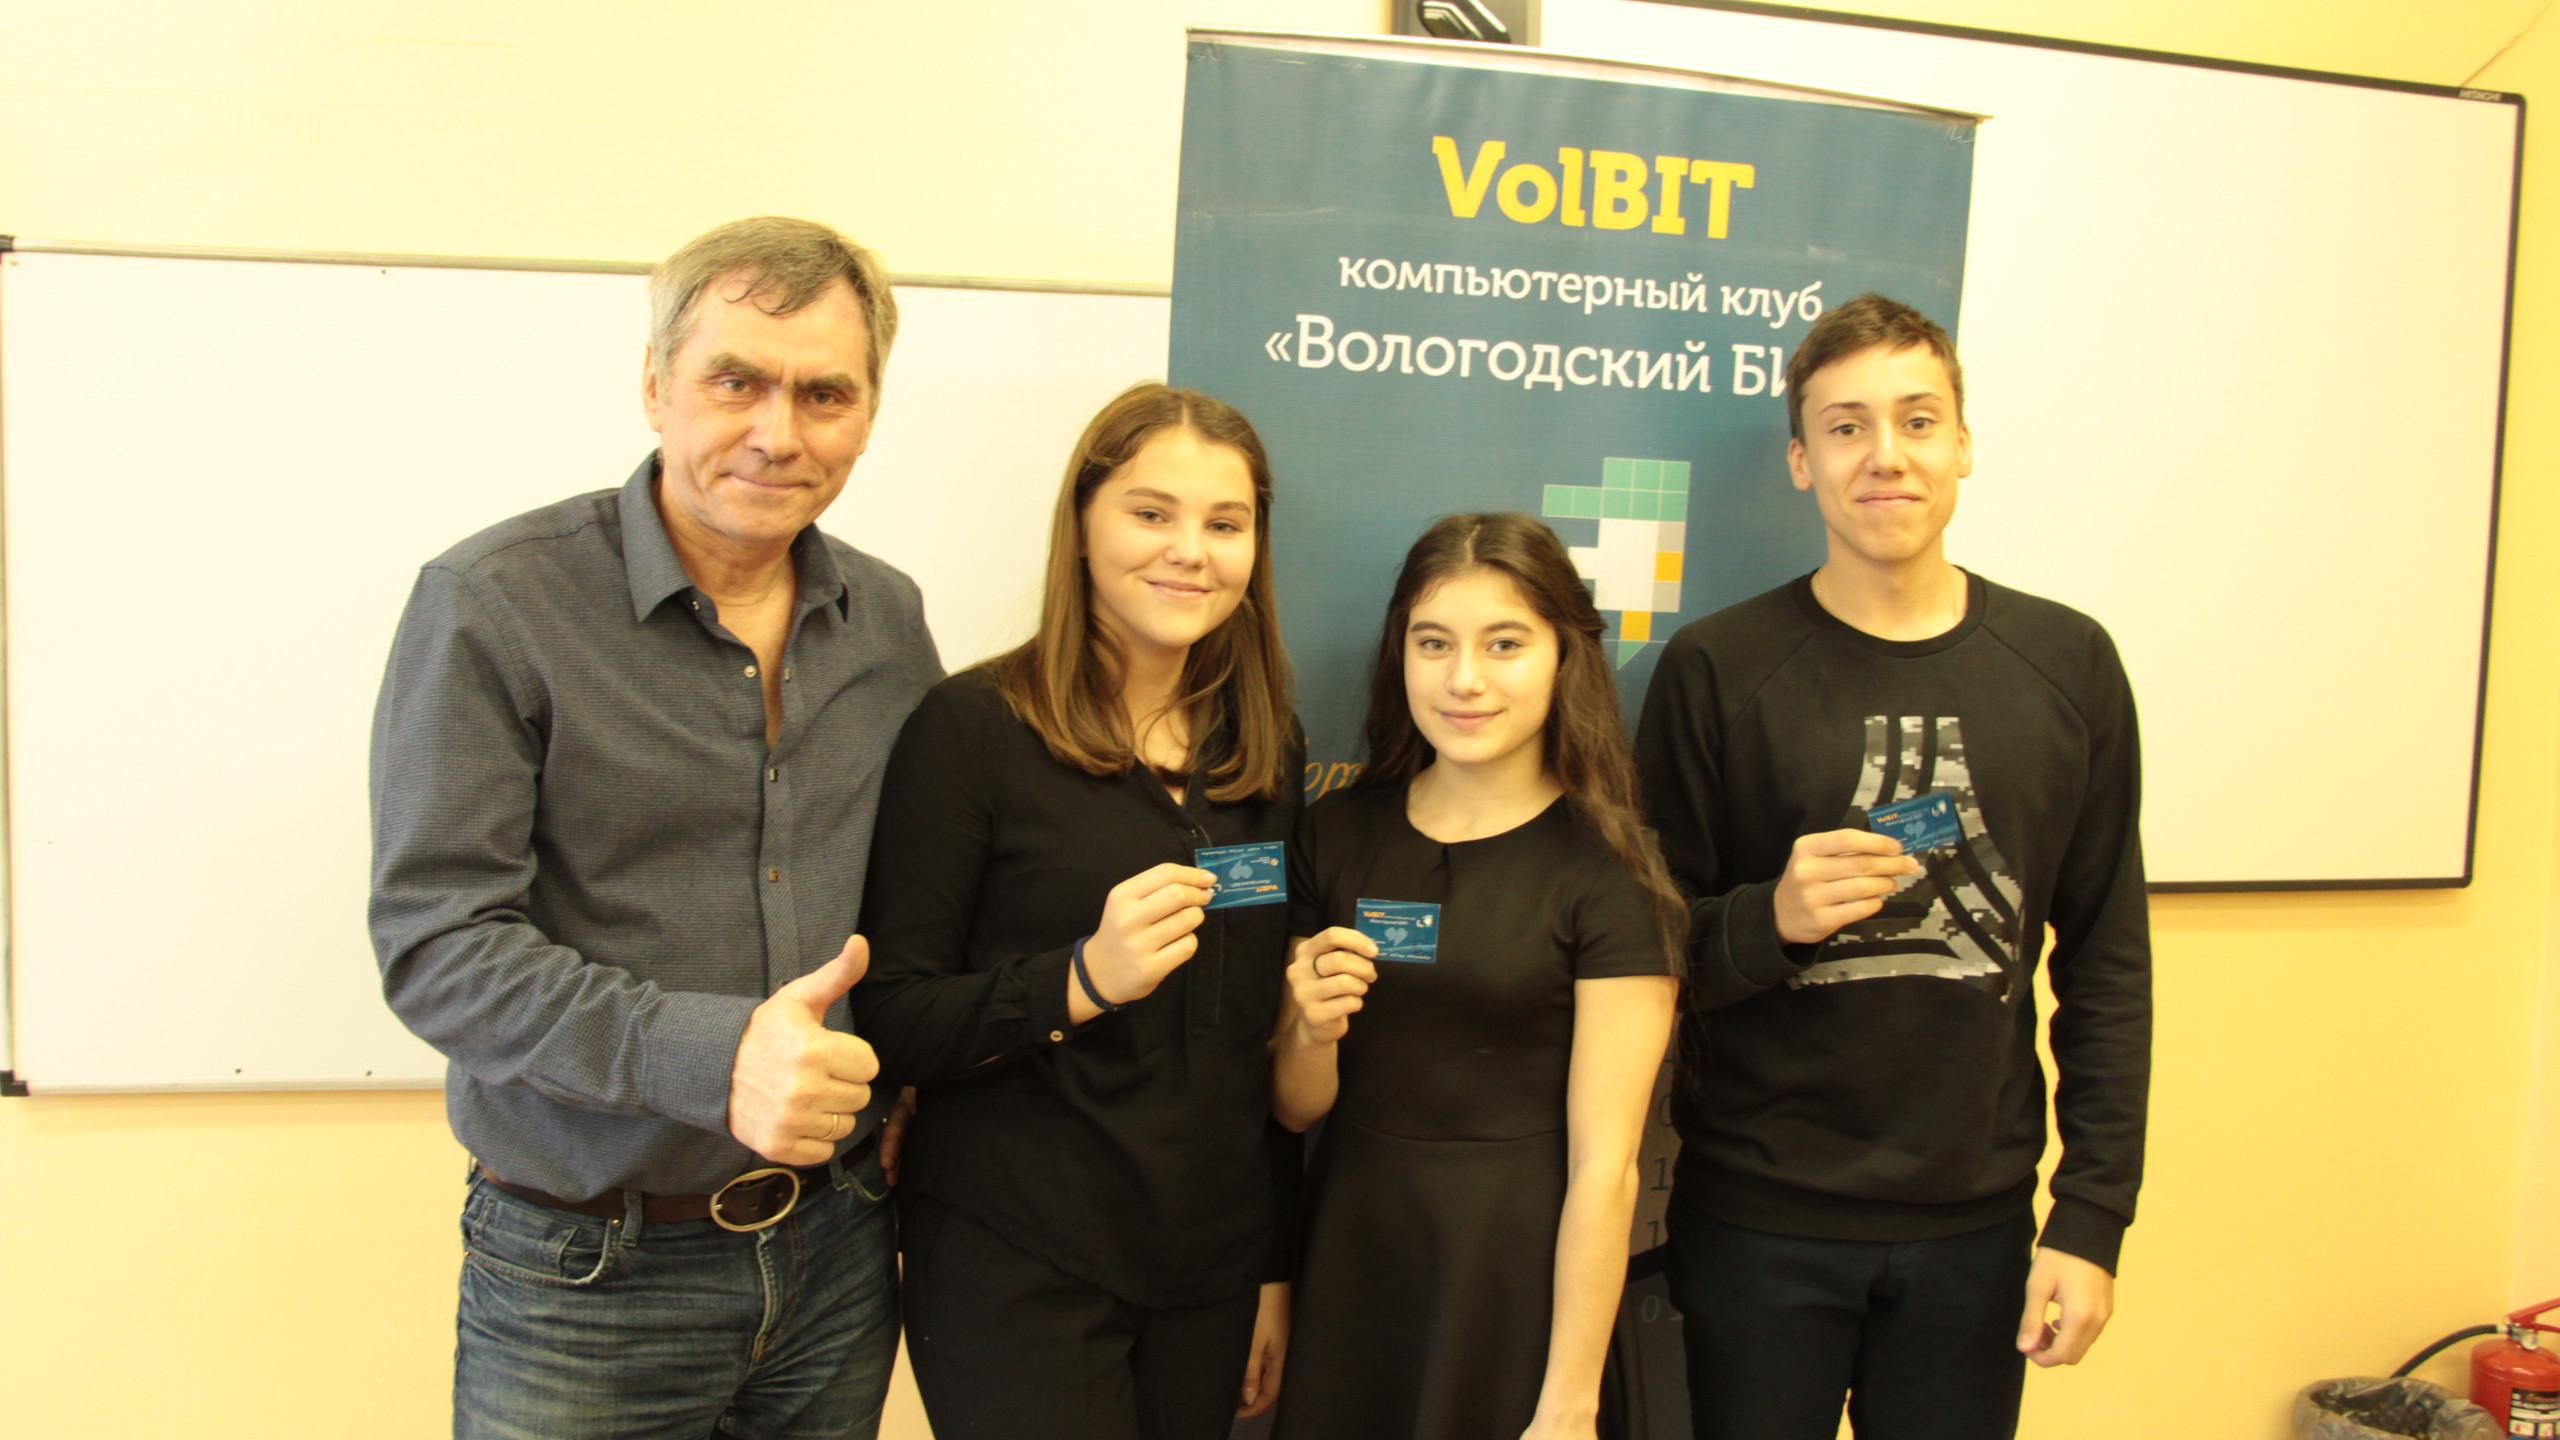 VolBIT в Кириллове